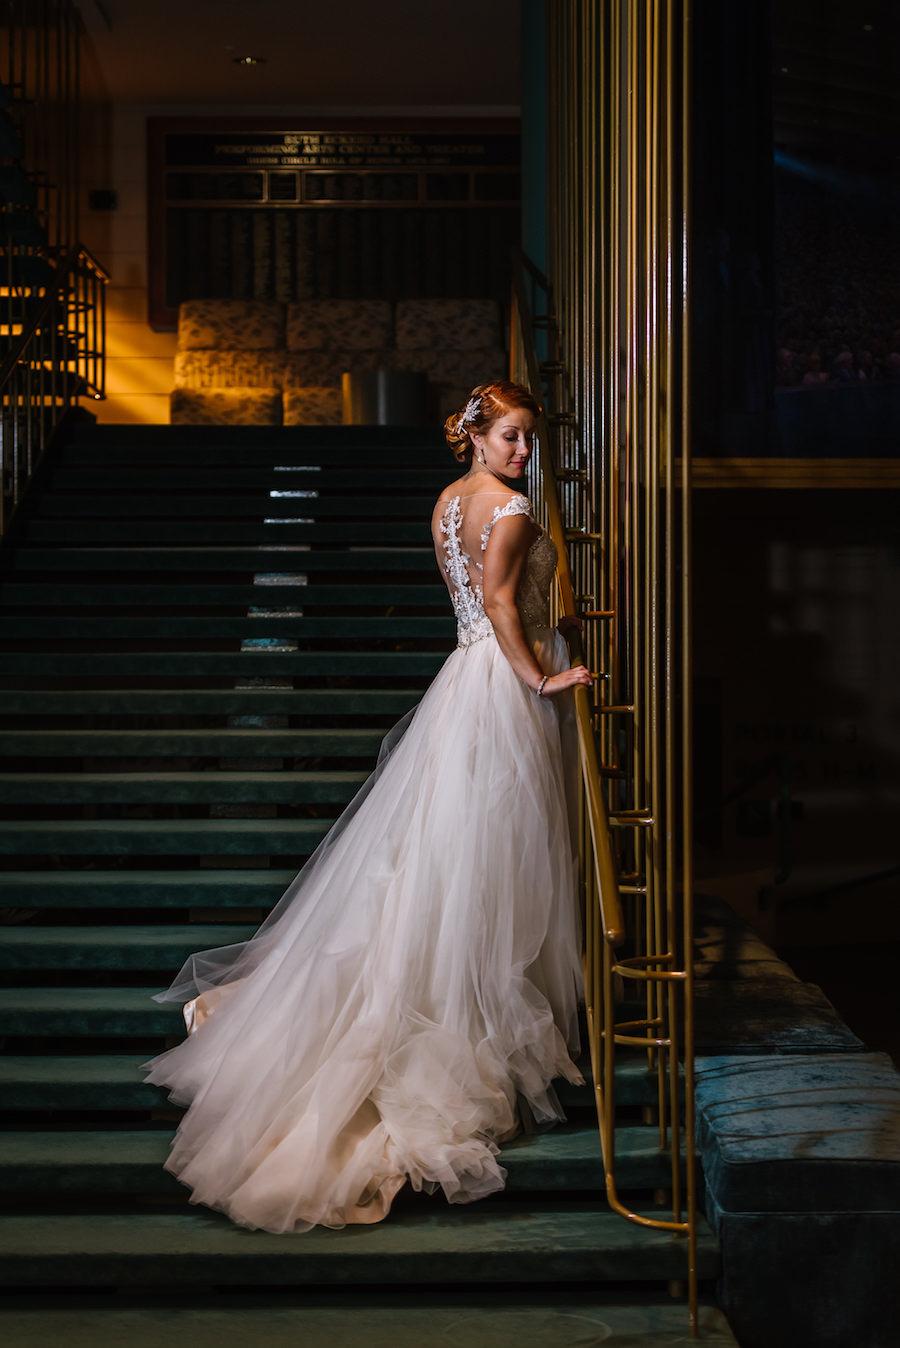 Nighttime Bridal Portrait wearing Maggie Sottero Lace Back Ballgown Blush Wedding Dress   Tampa Bay Wedding Venue Ruth Eckerd Hall